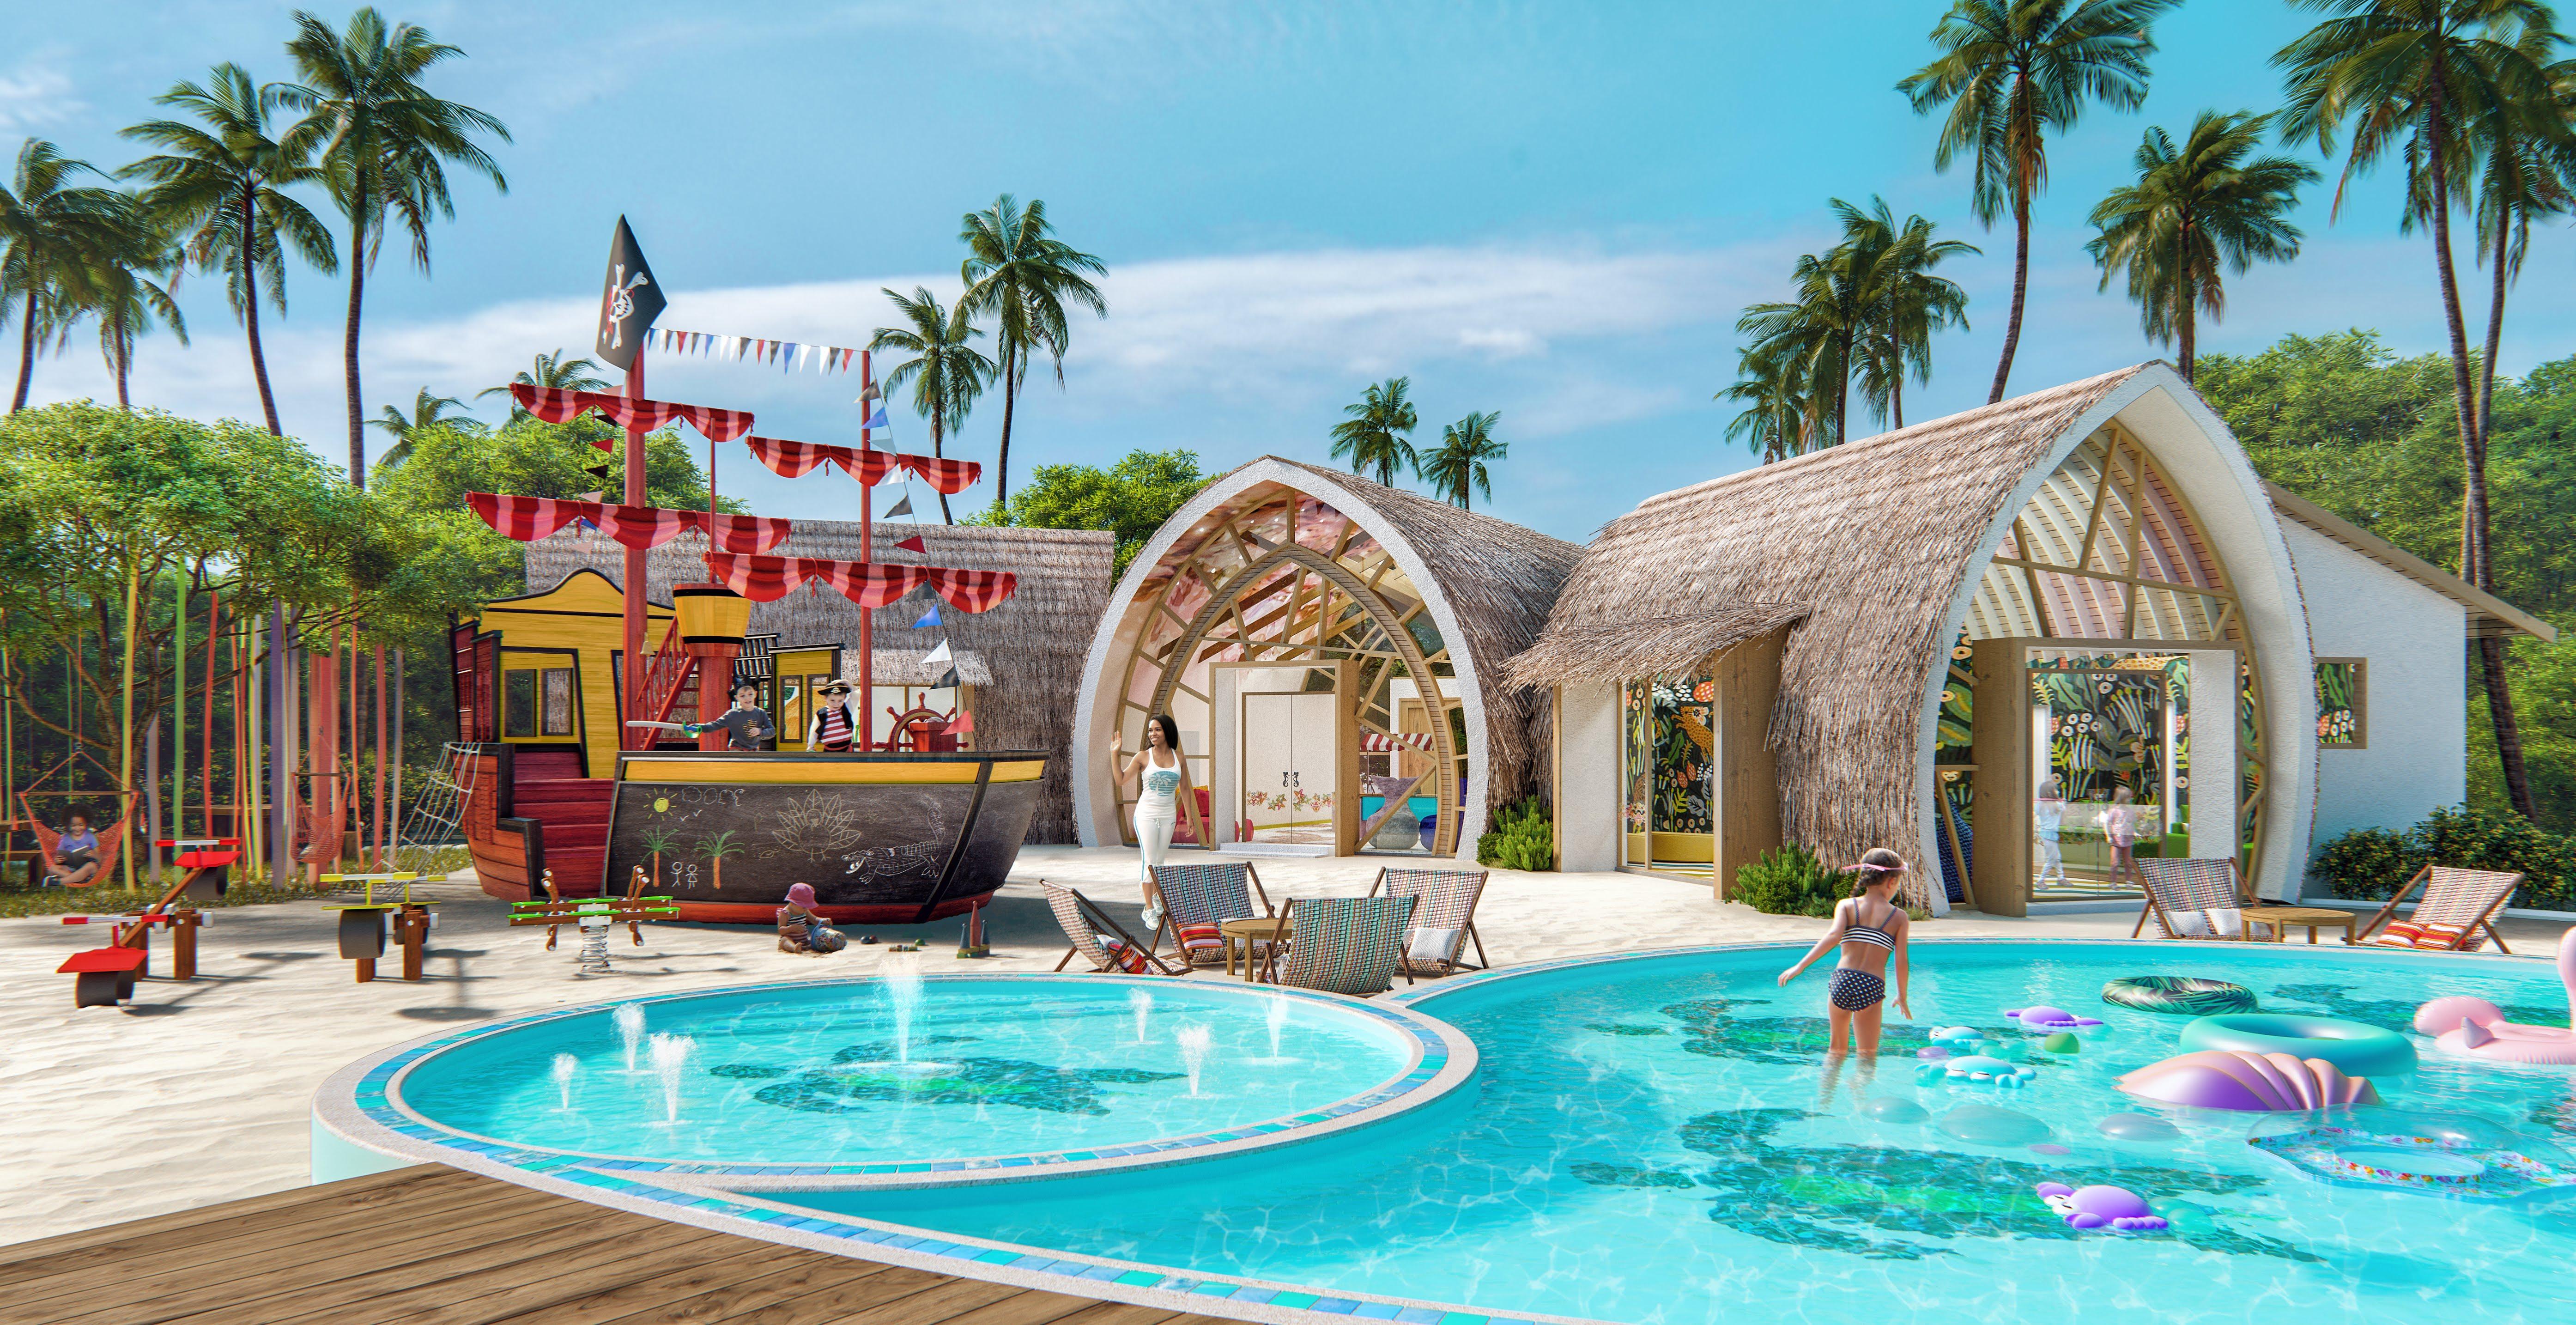 Jw Marriott Maldives Resort Spa Opening Early Autumn 2019